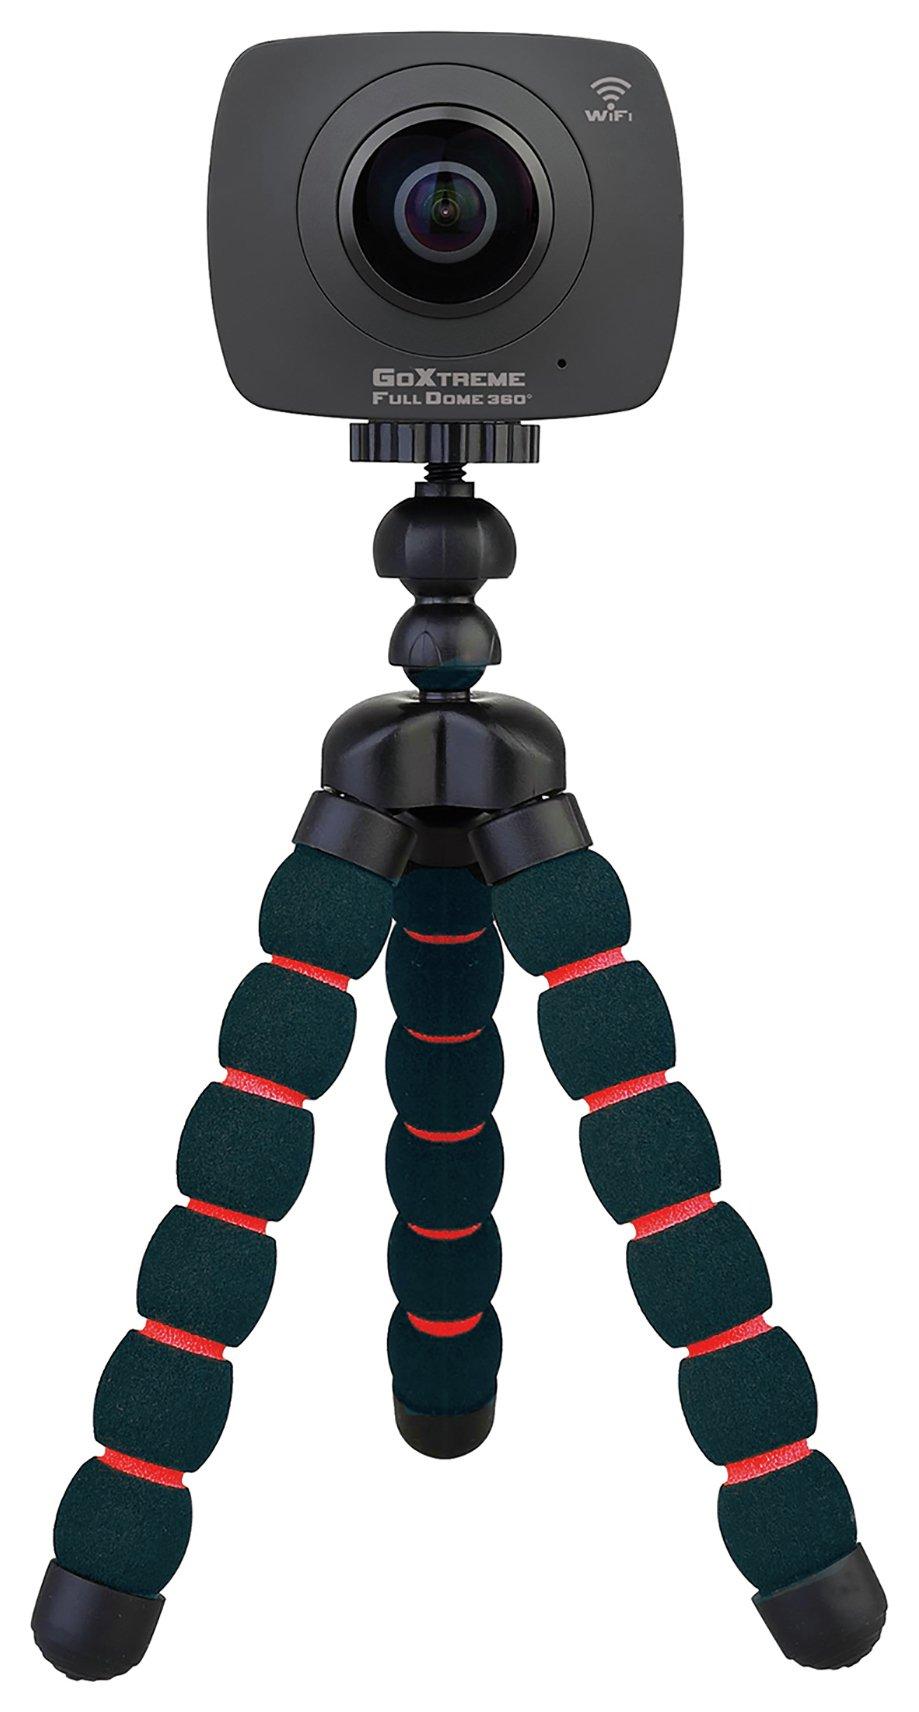 GoXtreme Full Dome 360 Degree Action Camera